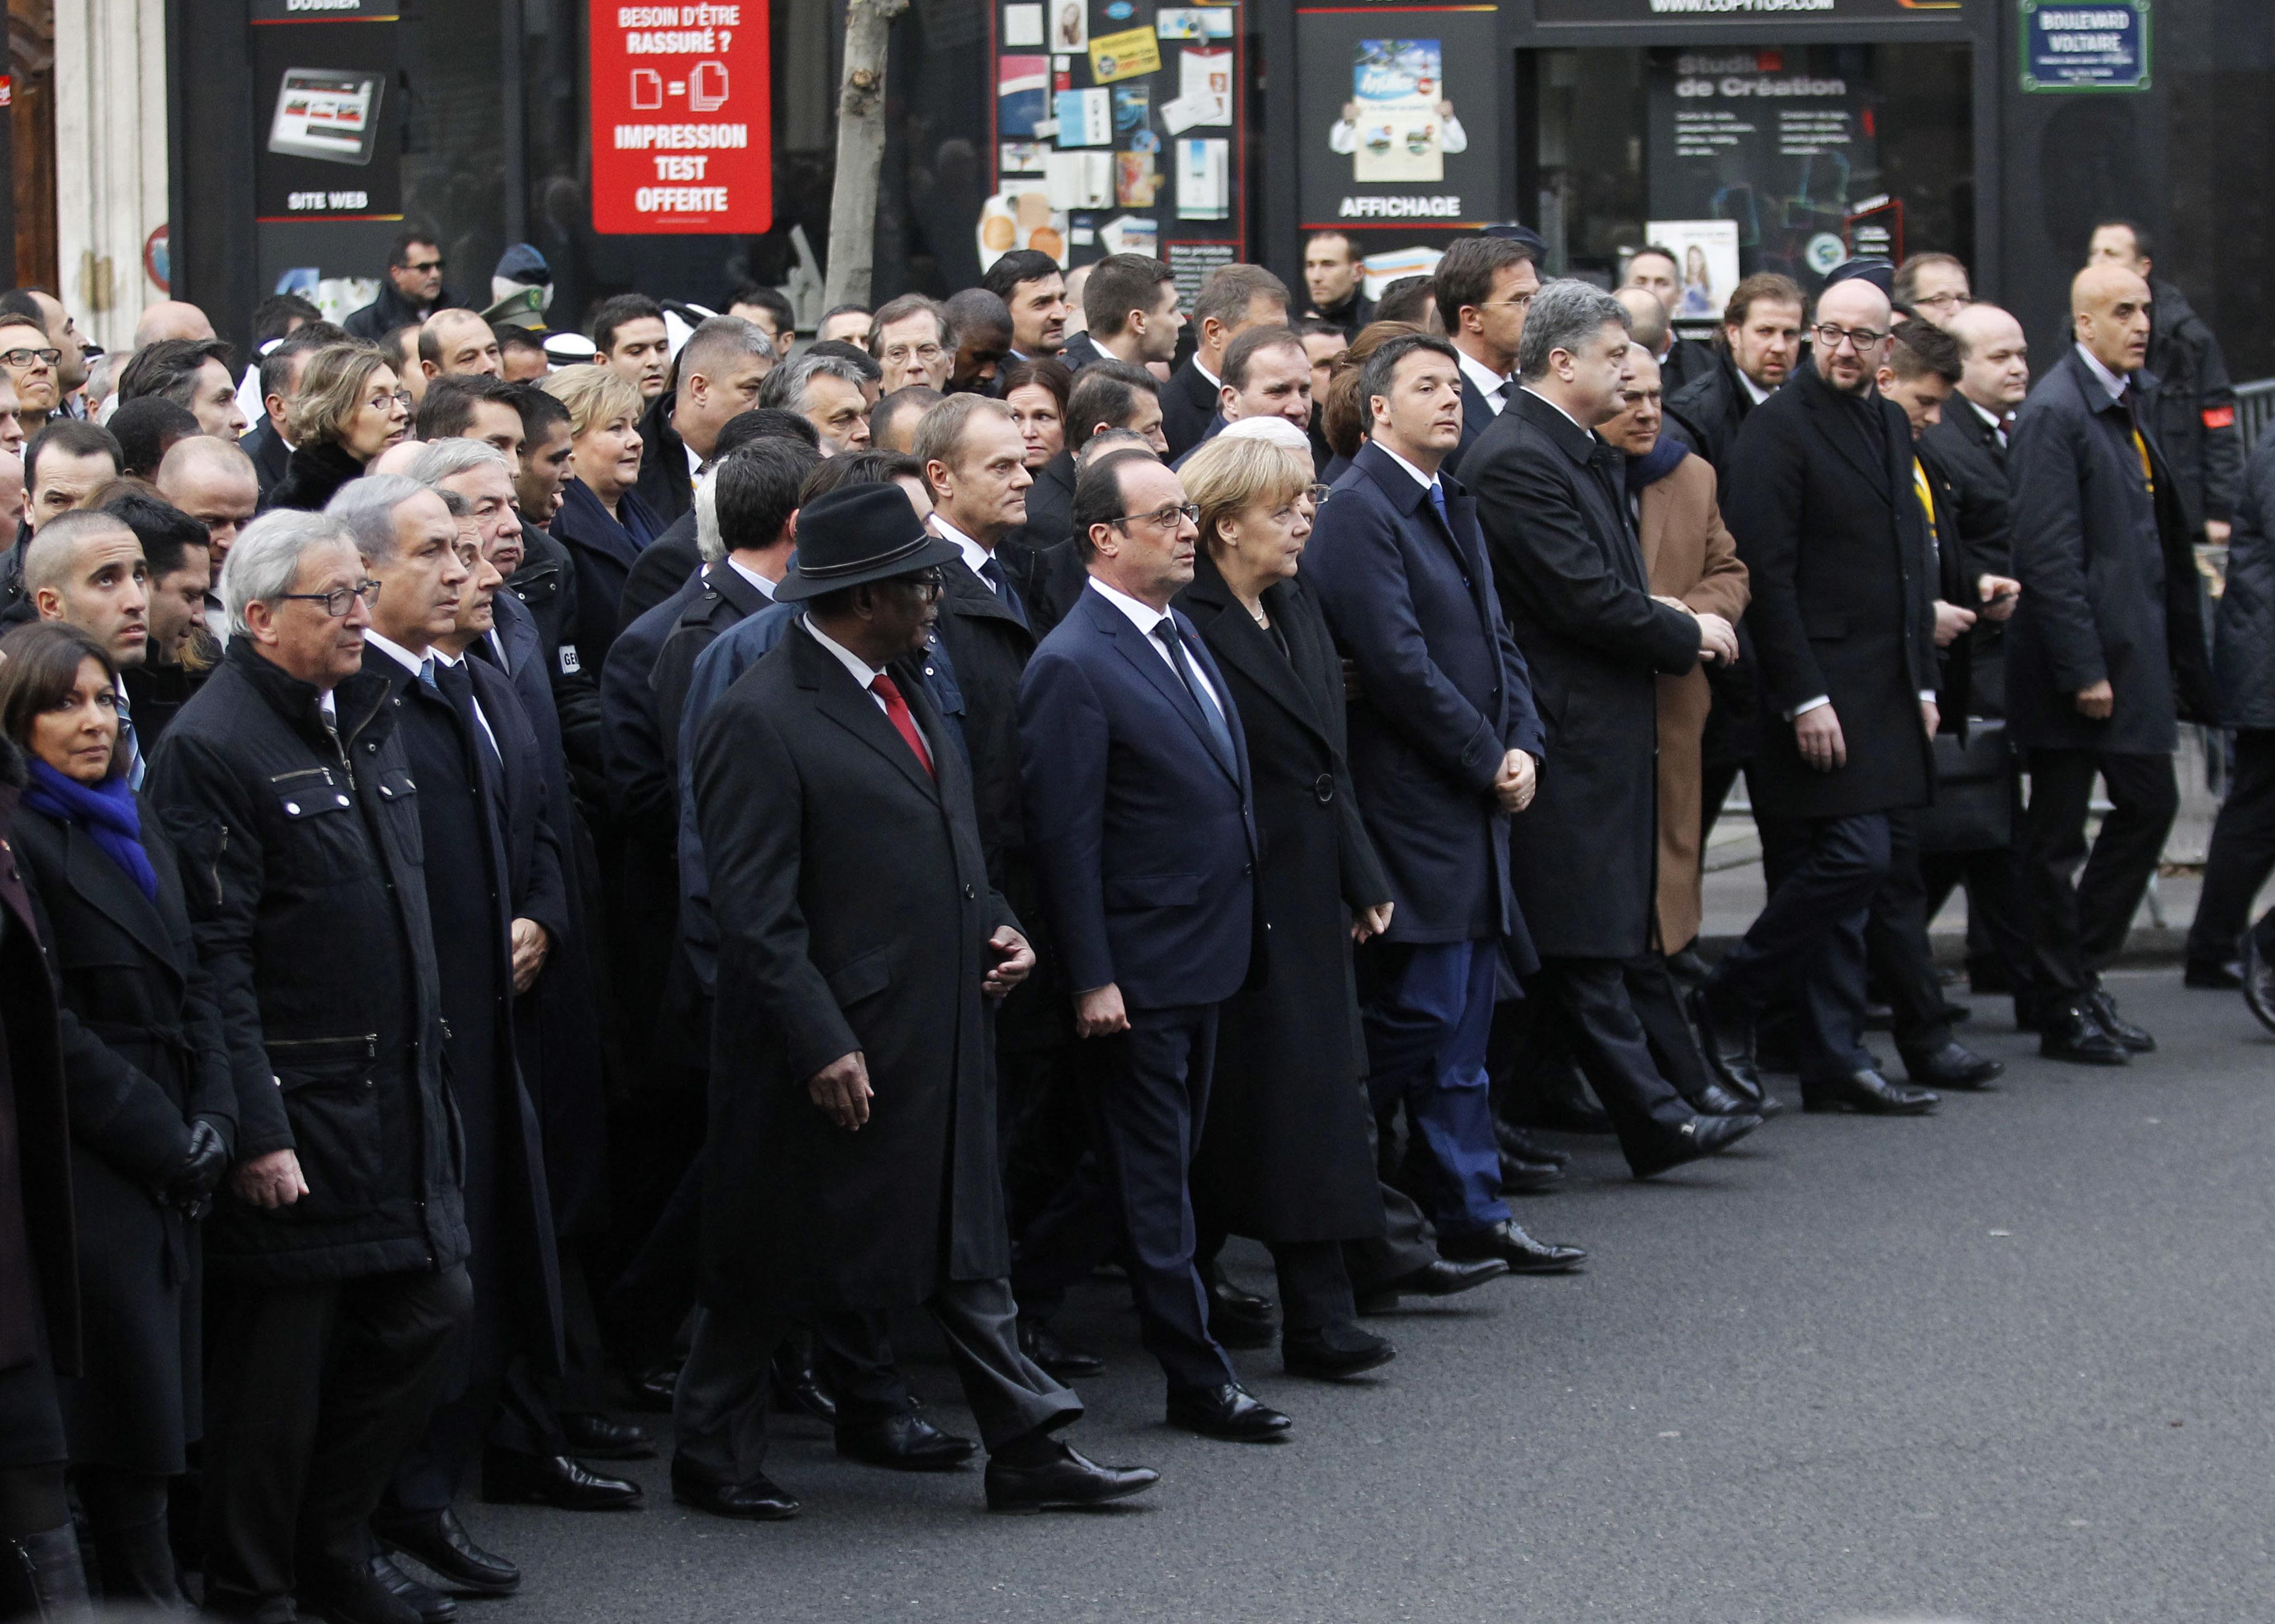 Politici kráčali jednotne na čele sprievodu. FOTO - ČTK